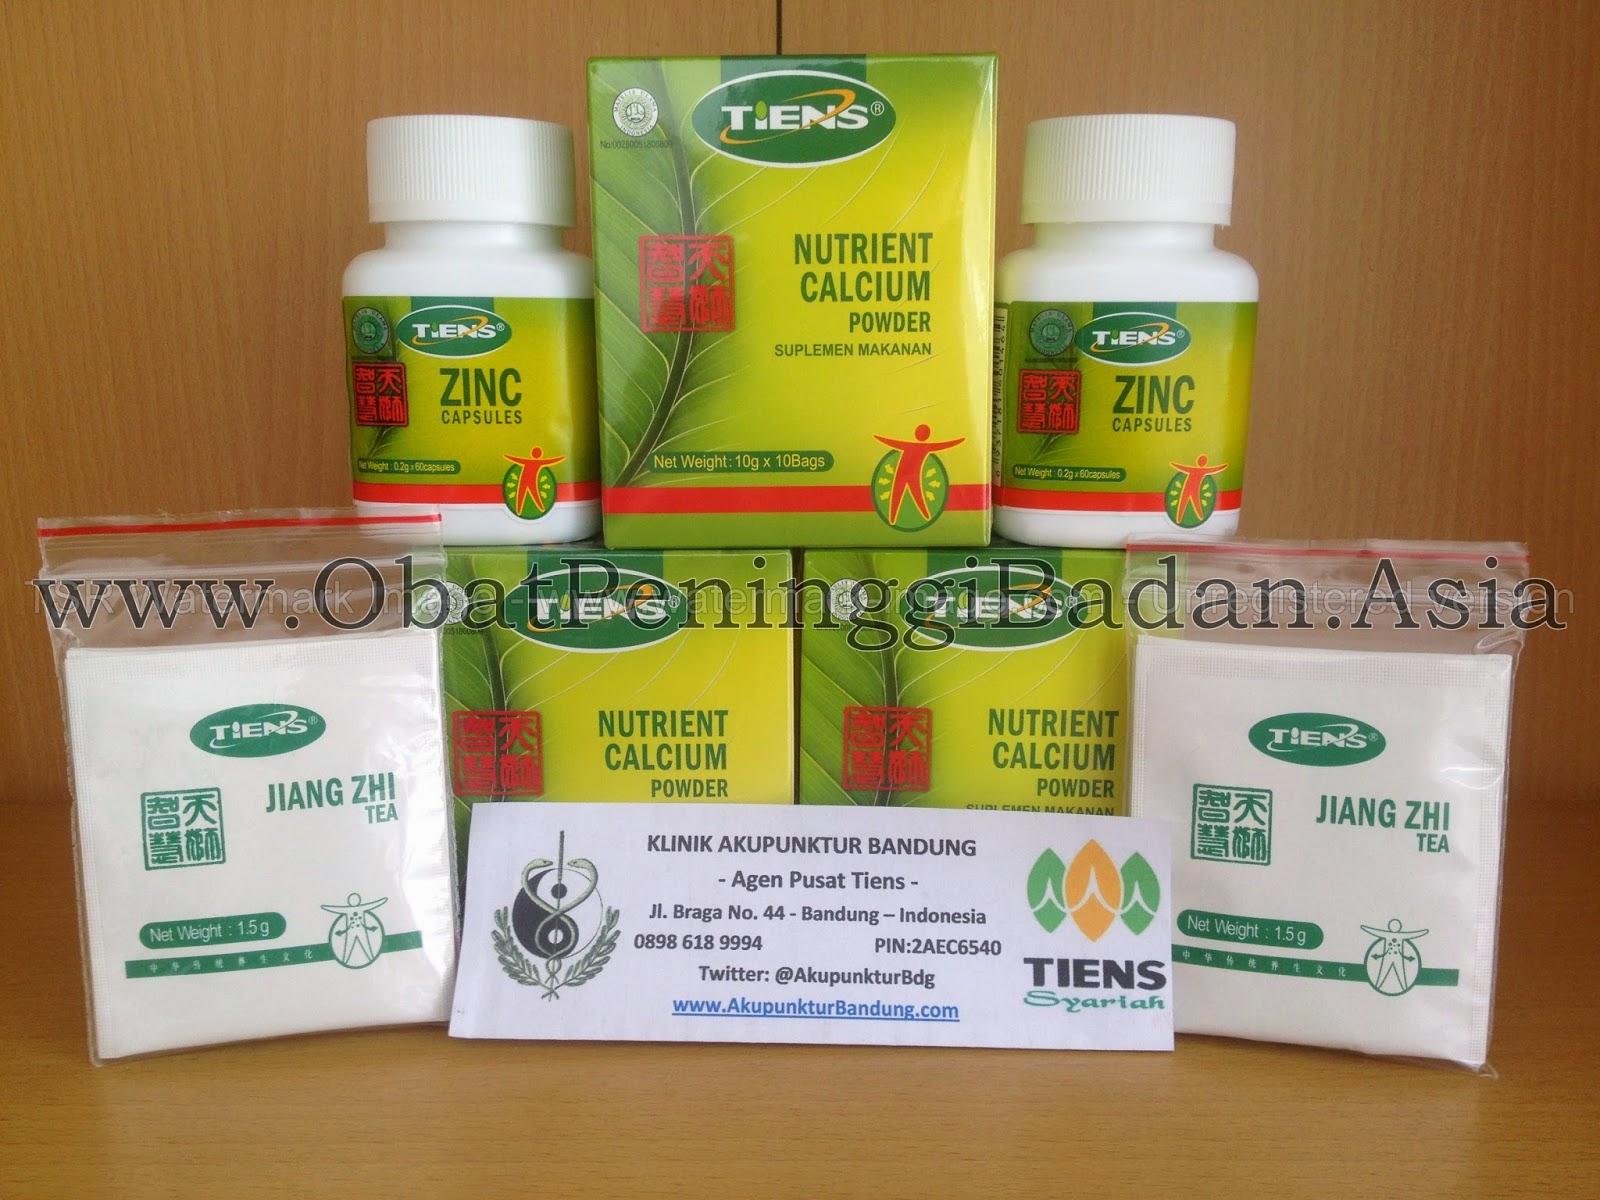 Obat Peninggi Badan Tiens Apotik Tianshi NHCP NCP Agen Pusat Tiens Klinik Akupunktur Bandung Menambah Tinggi Badan Meninggikan Tambah Tinggi Kalsium NHCP Spirulina Teh Zinc Detox Glucosamine Herbal